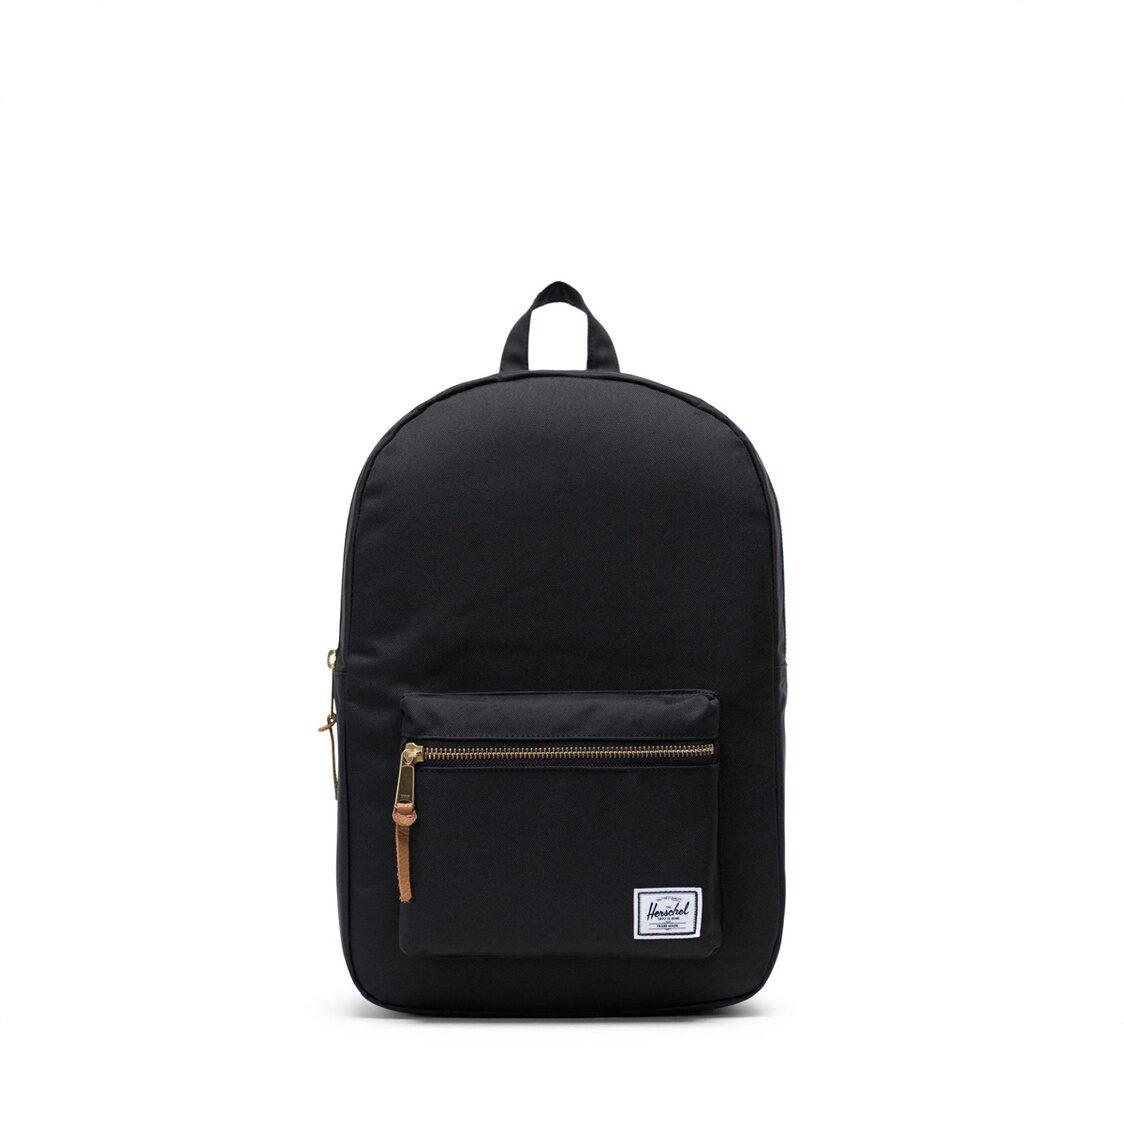 Herschel Settlement Mid Volume Black Backpack 10033-00001-OS